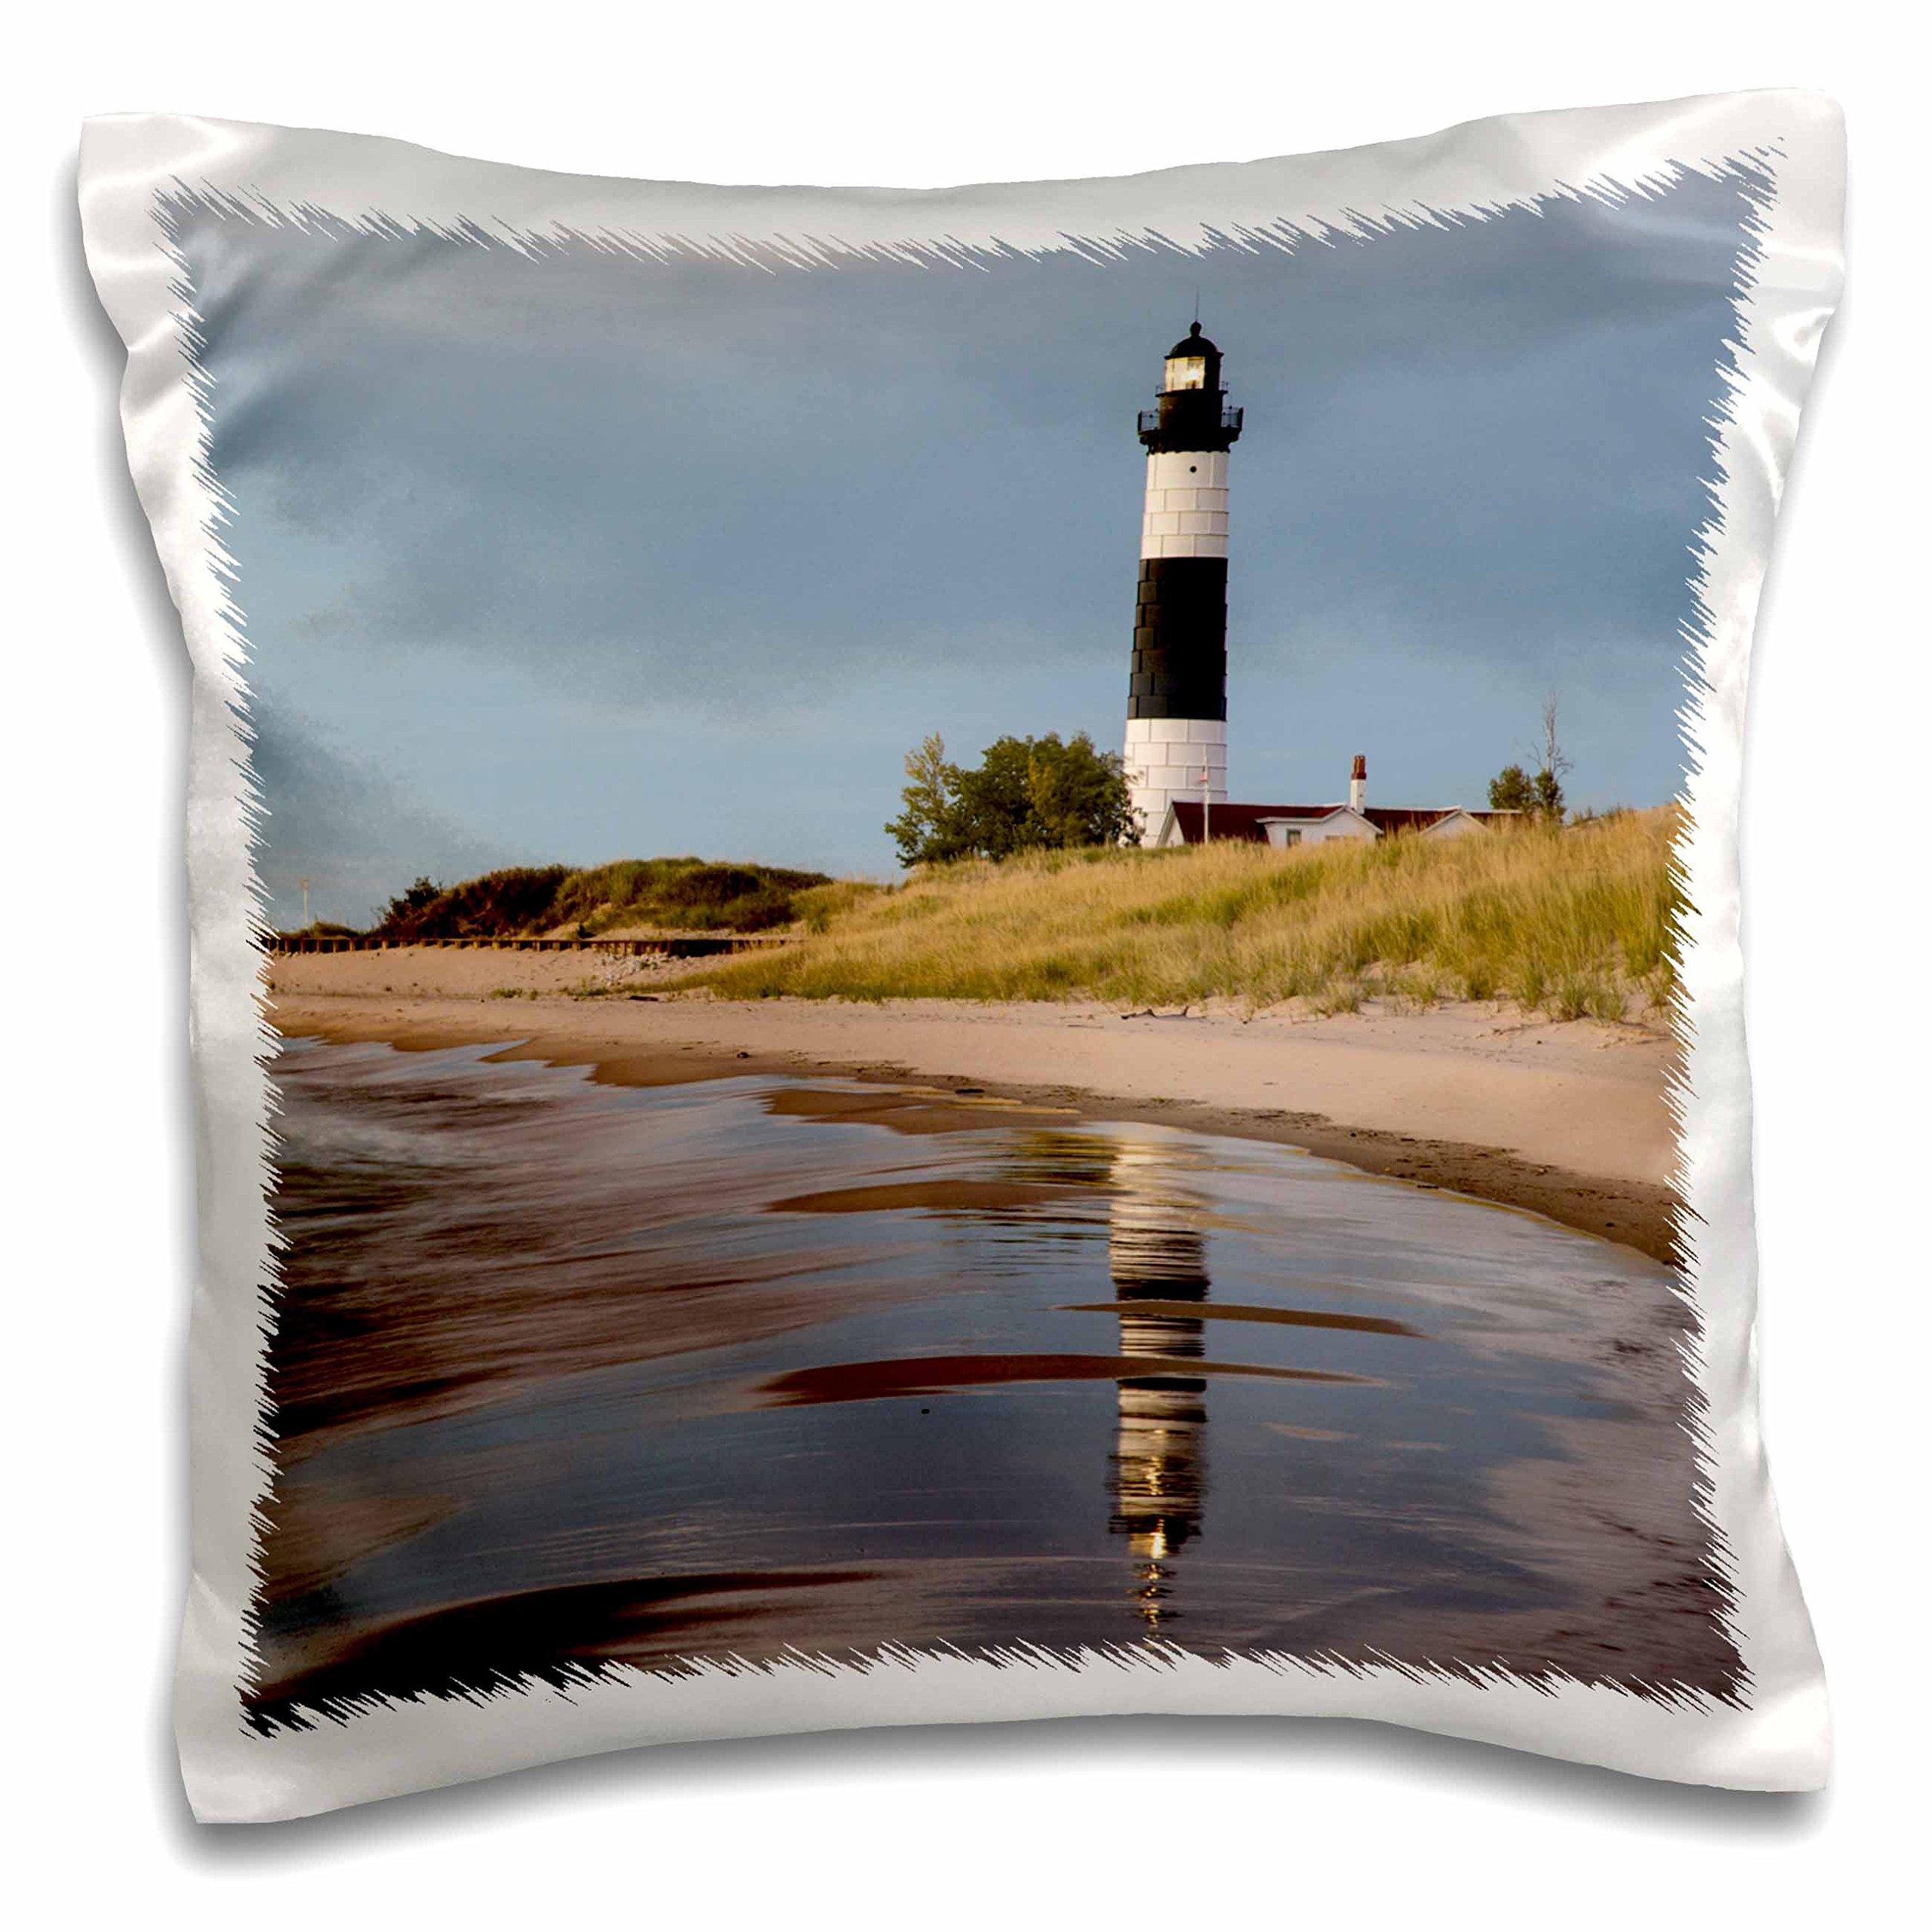 3dRose pc_190090_1 Big Sable Point Lighthouse, Lake Michigan, Ludington Spa, Michigan, Use Pillow Case, 16 x 16